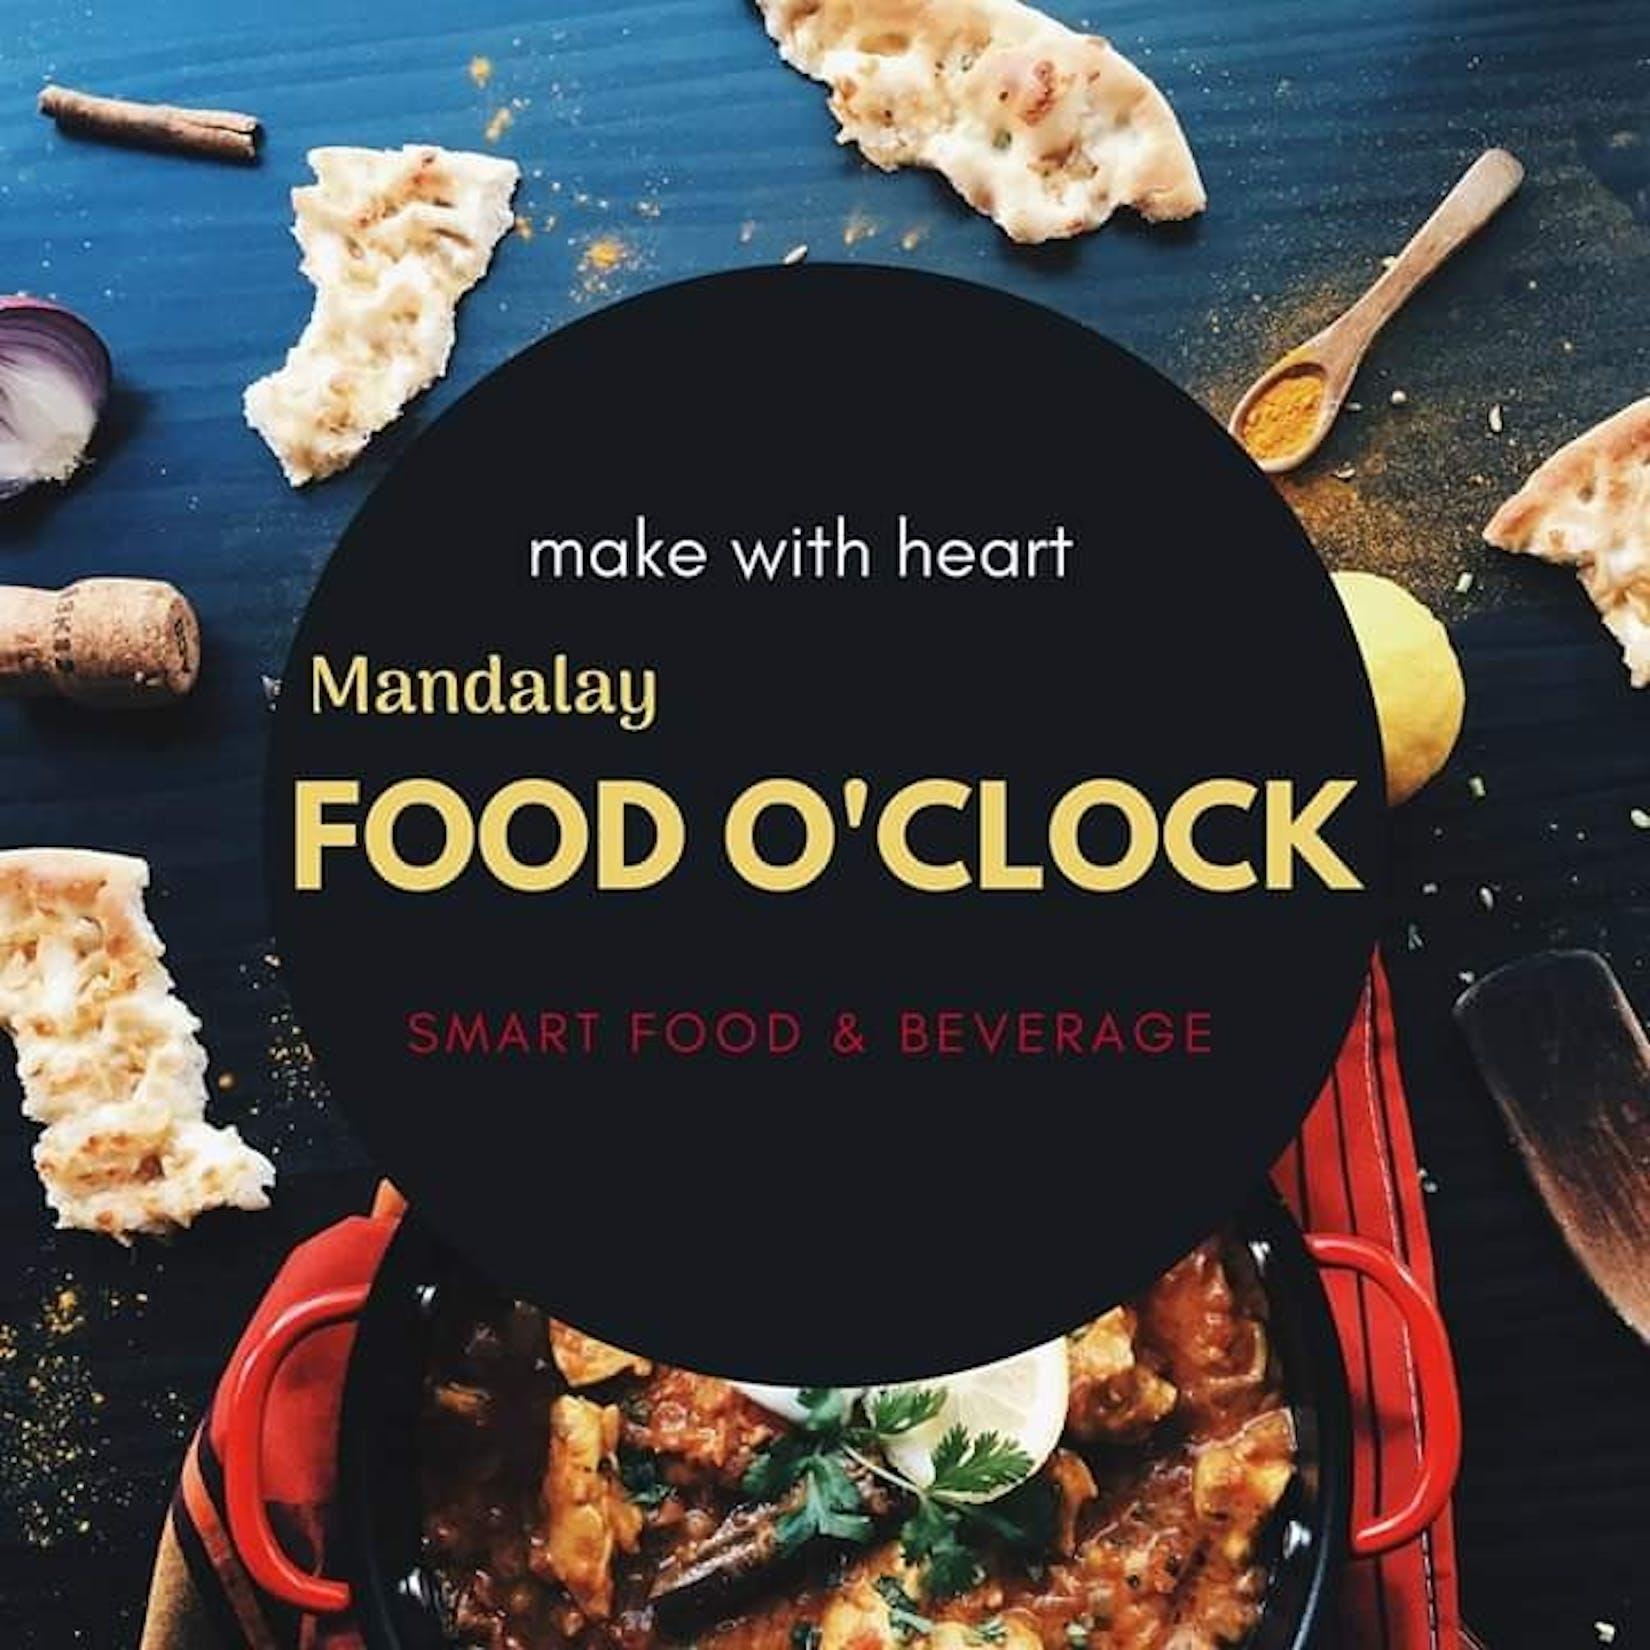 Mandalay Food O' Clock (Beverage & Smart Food) | yathar